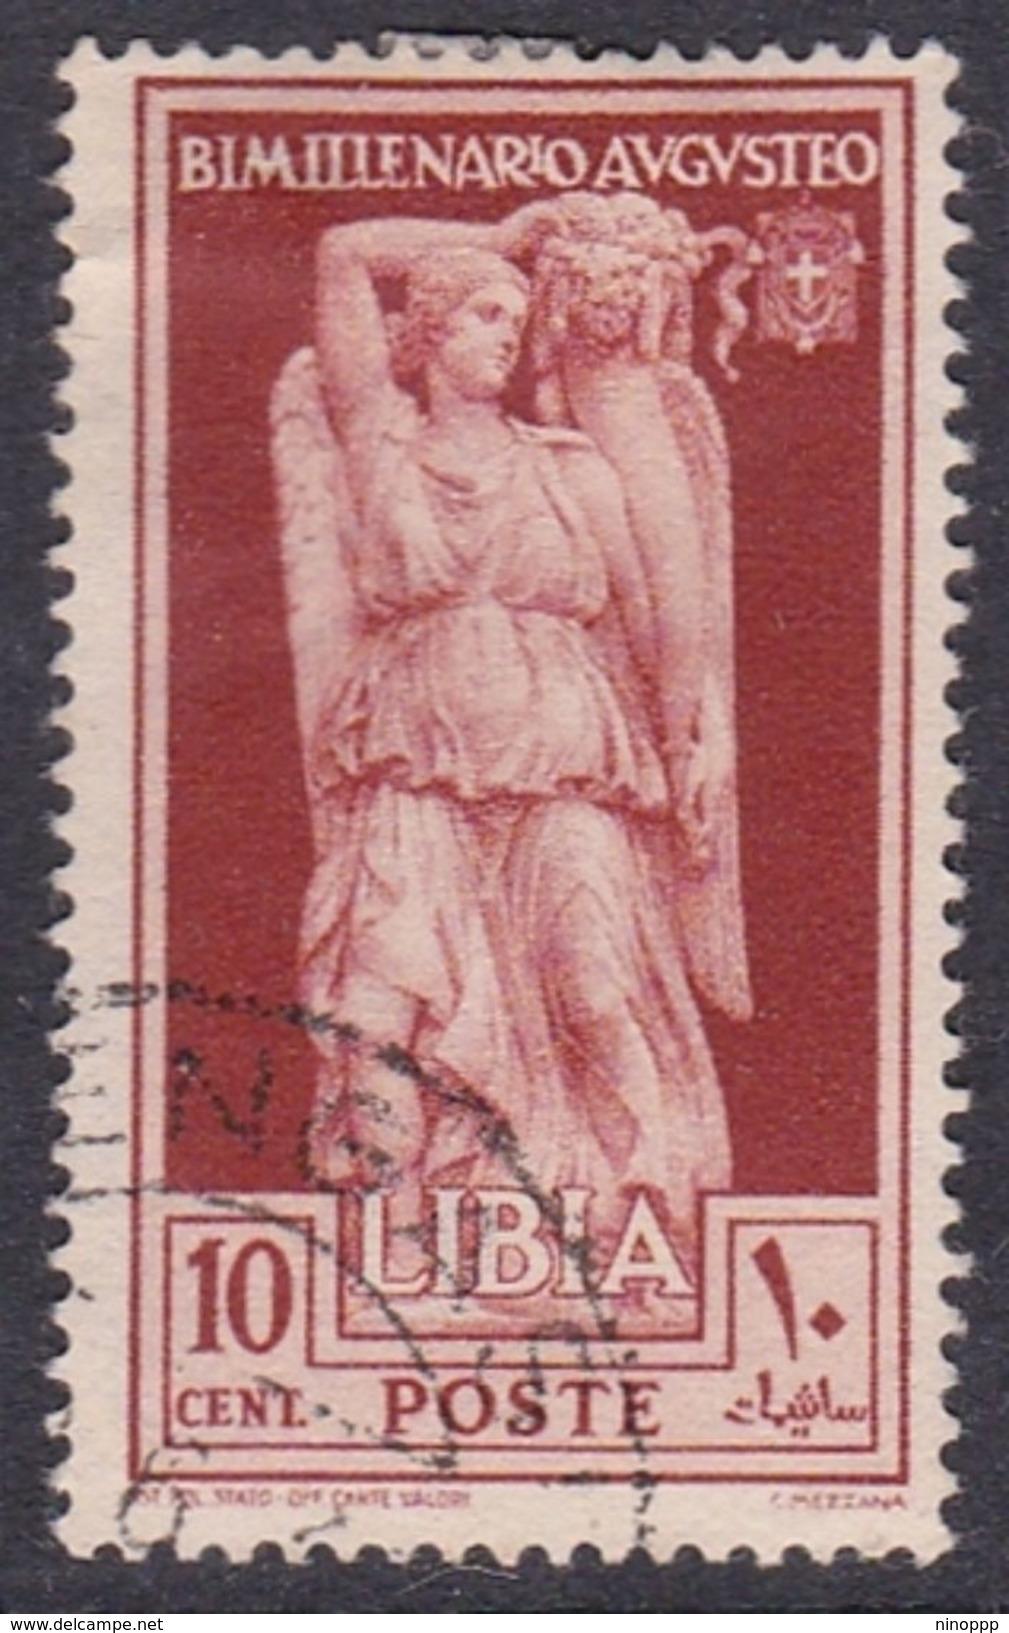 Italy-Colonies And Territories-Libya S 153 1938 Augustus Birth Bimillenary,10c Red Brown,used - Libya